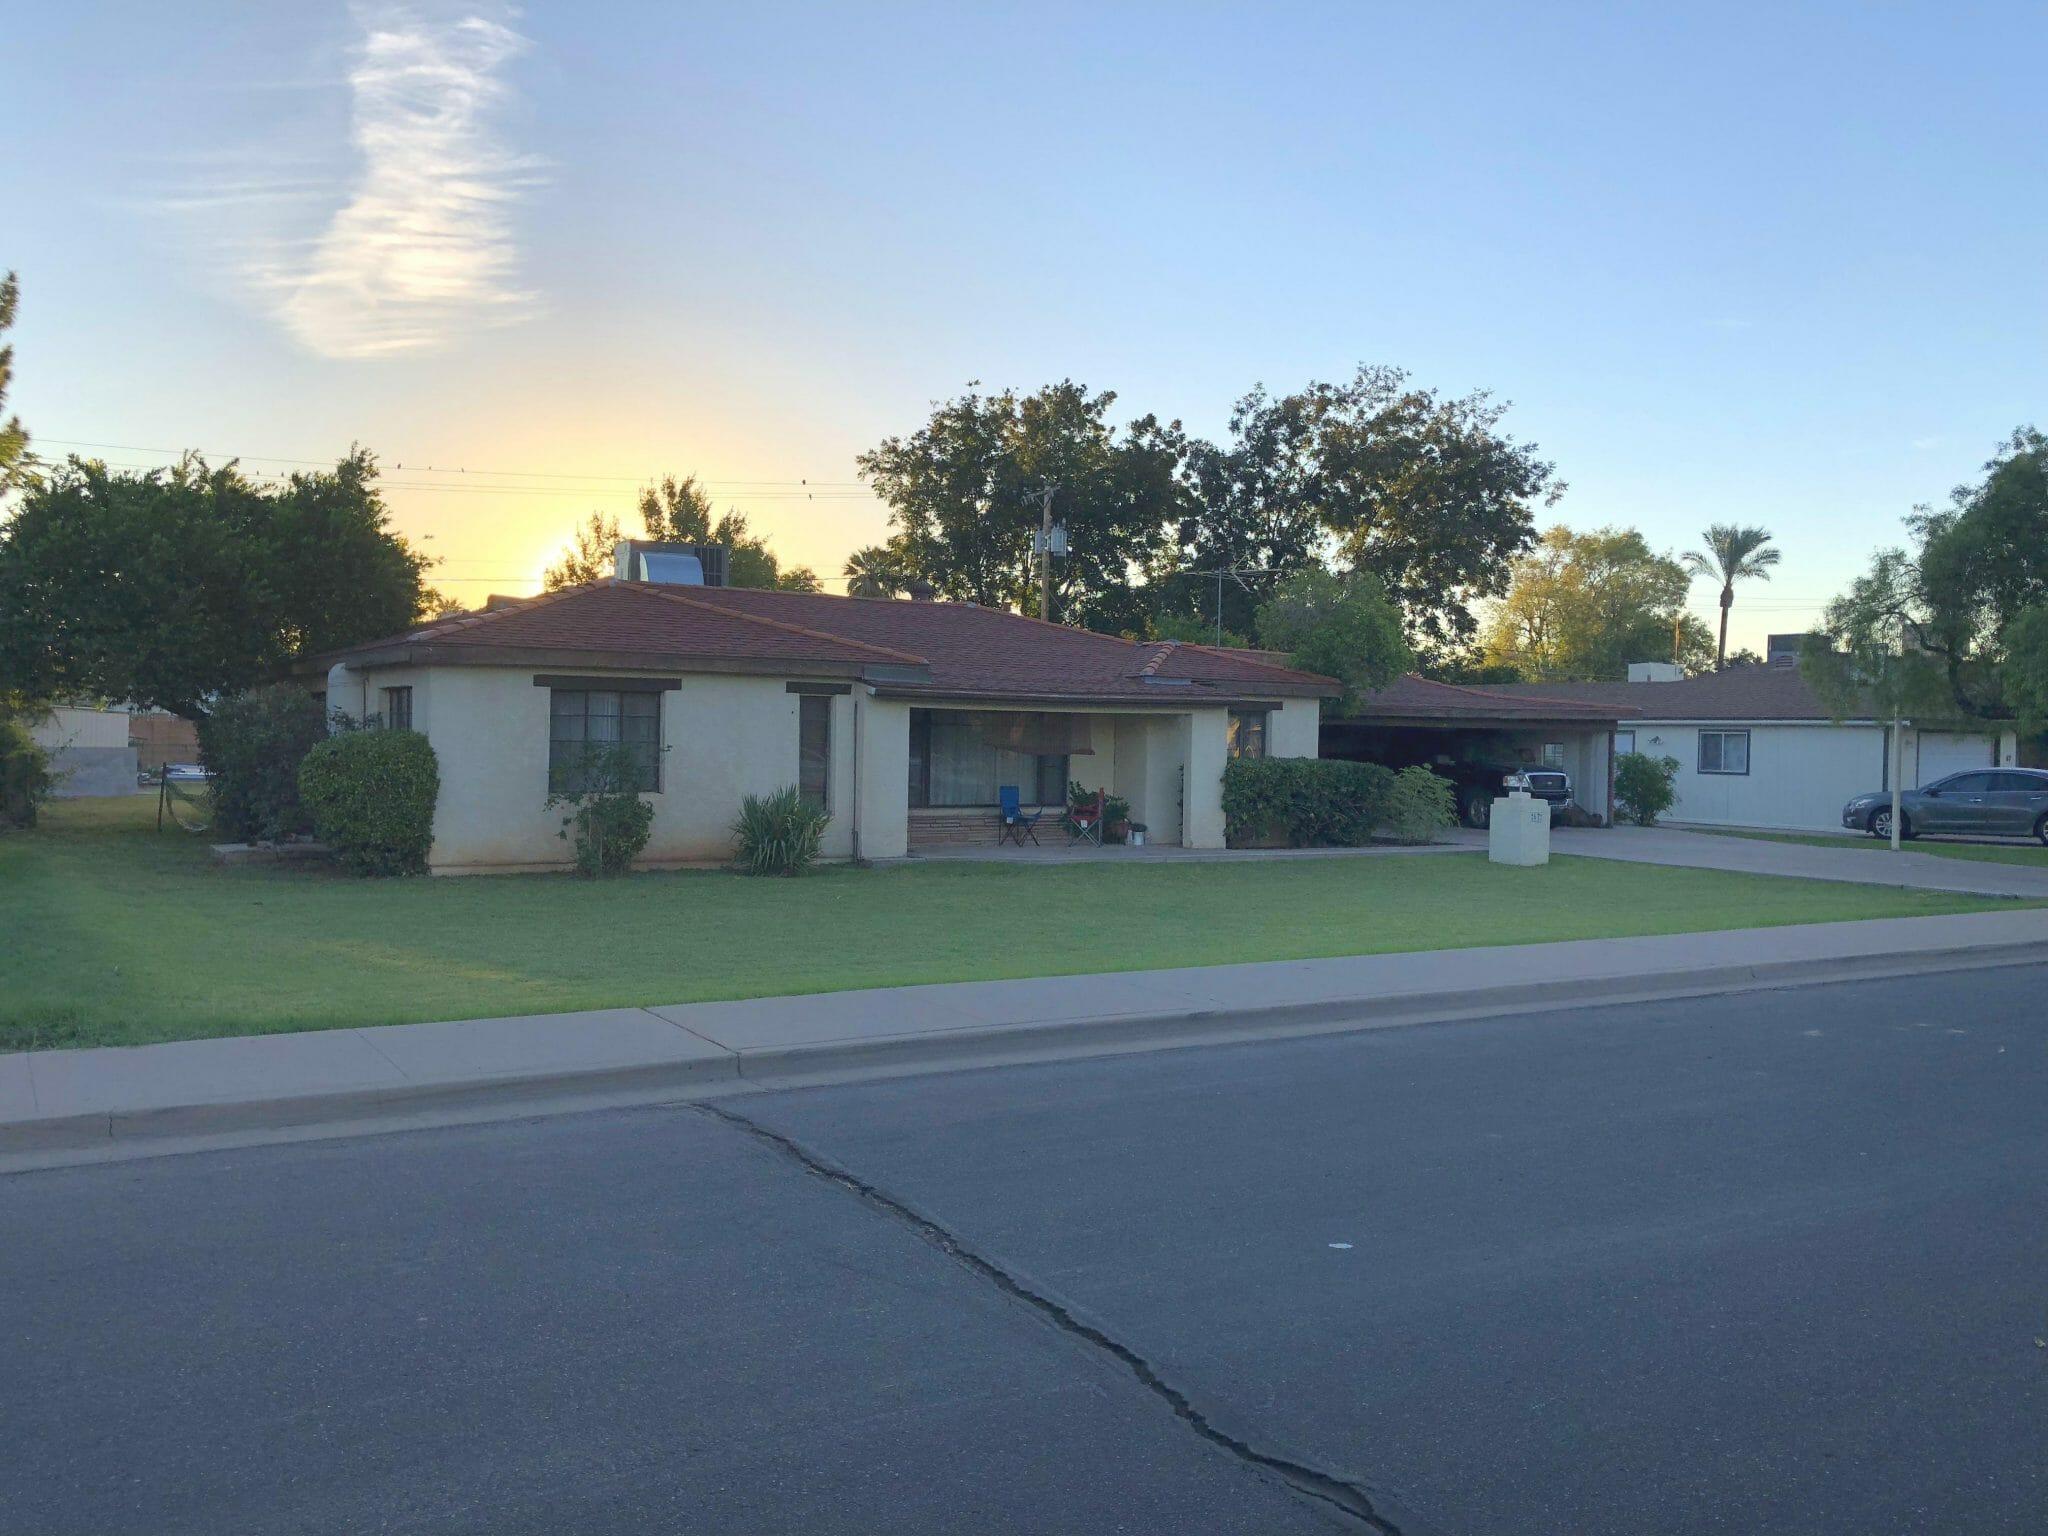 67 N Fraser Dr W, Mesa, AZ 85203